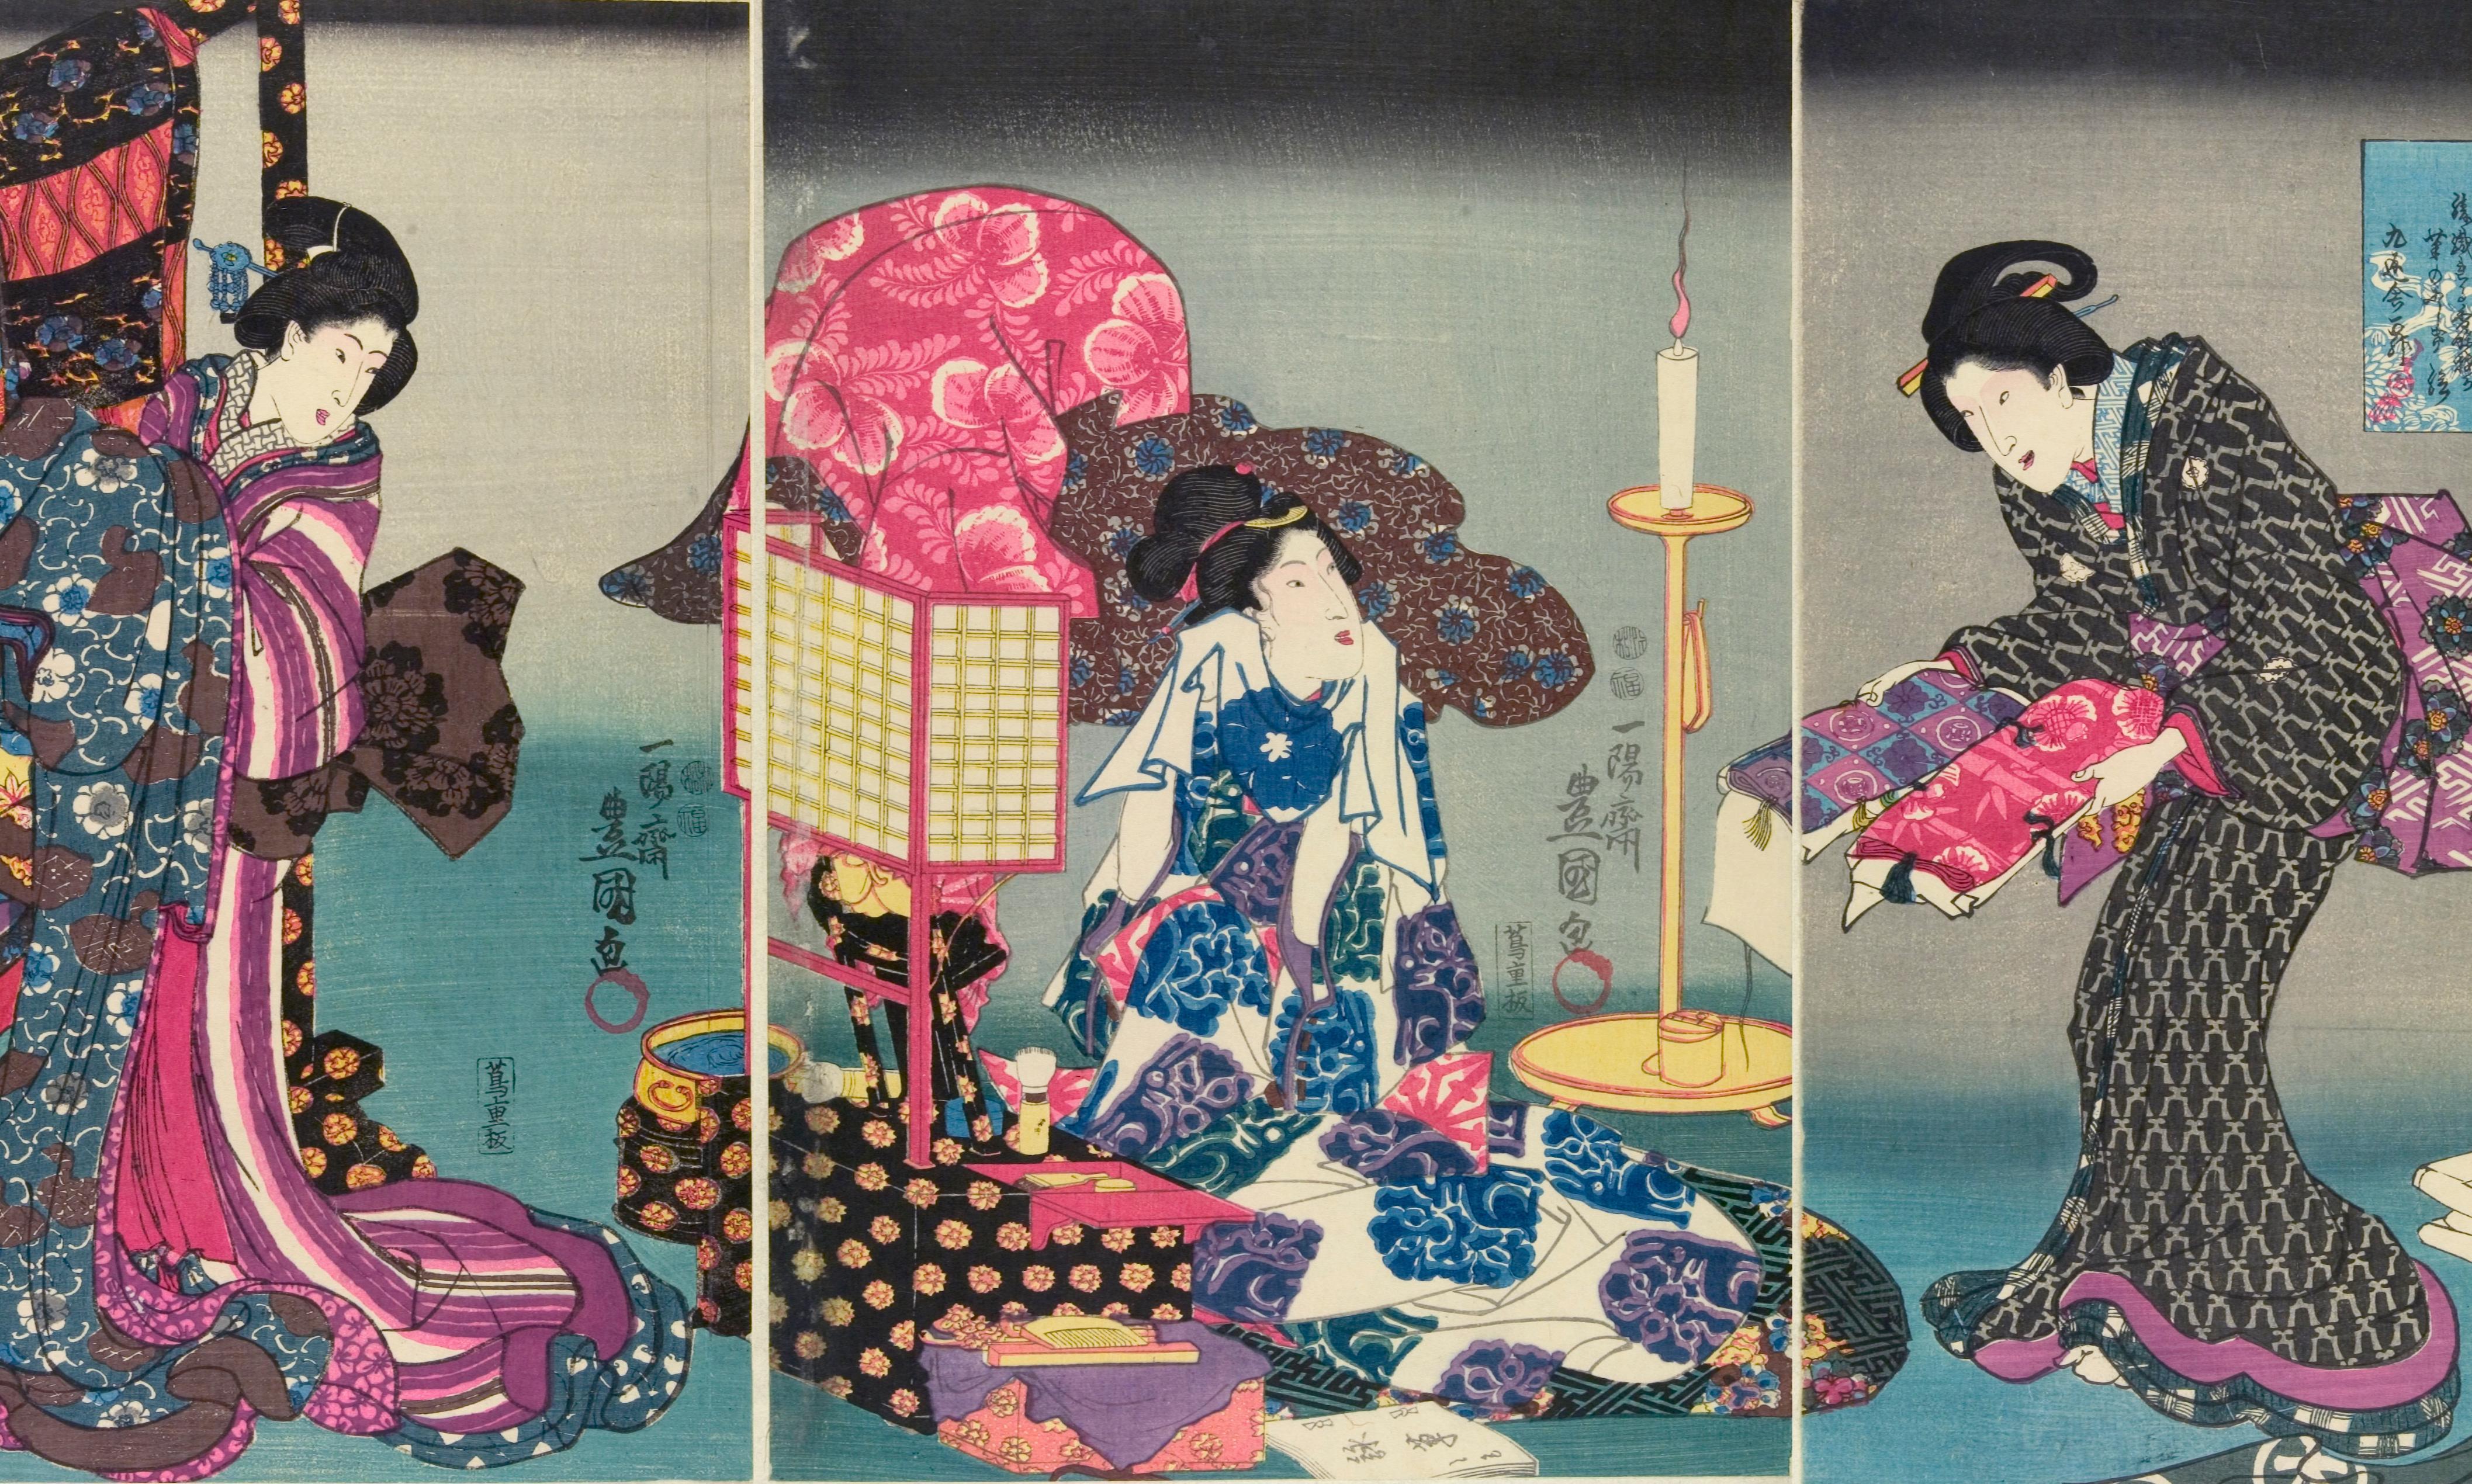 Fluid and fashionable: V&A shakes up image of 'traditional' kimono